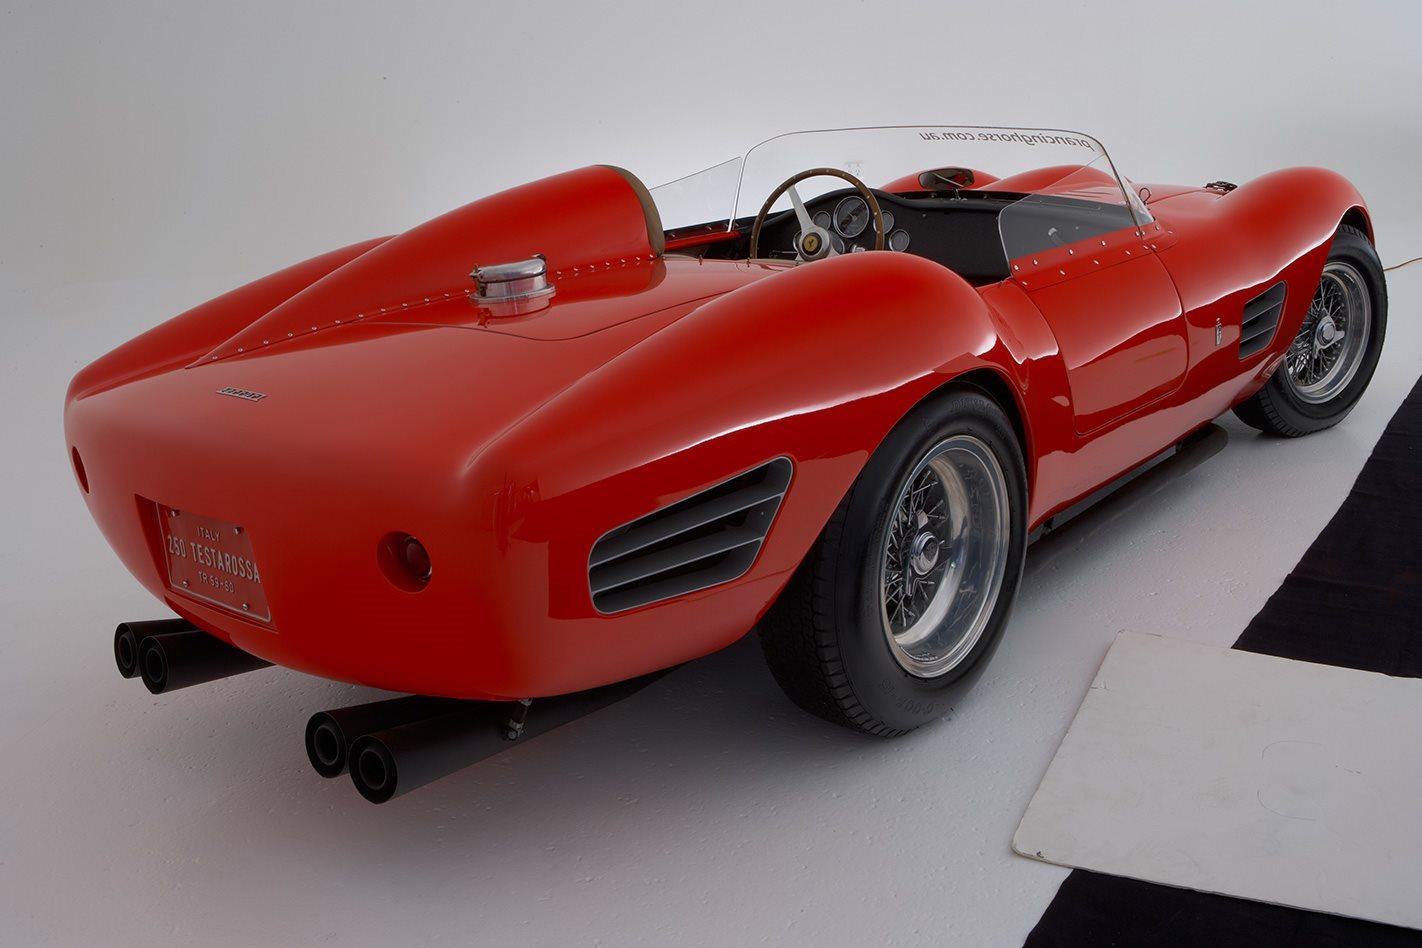 1959 ferrari 250 testa rossa legend series motor 1959 ferrari 250 testa rossa rear vanachro Gallery